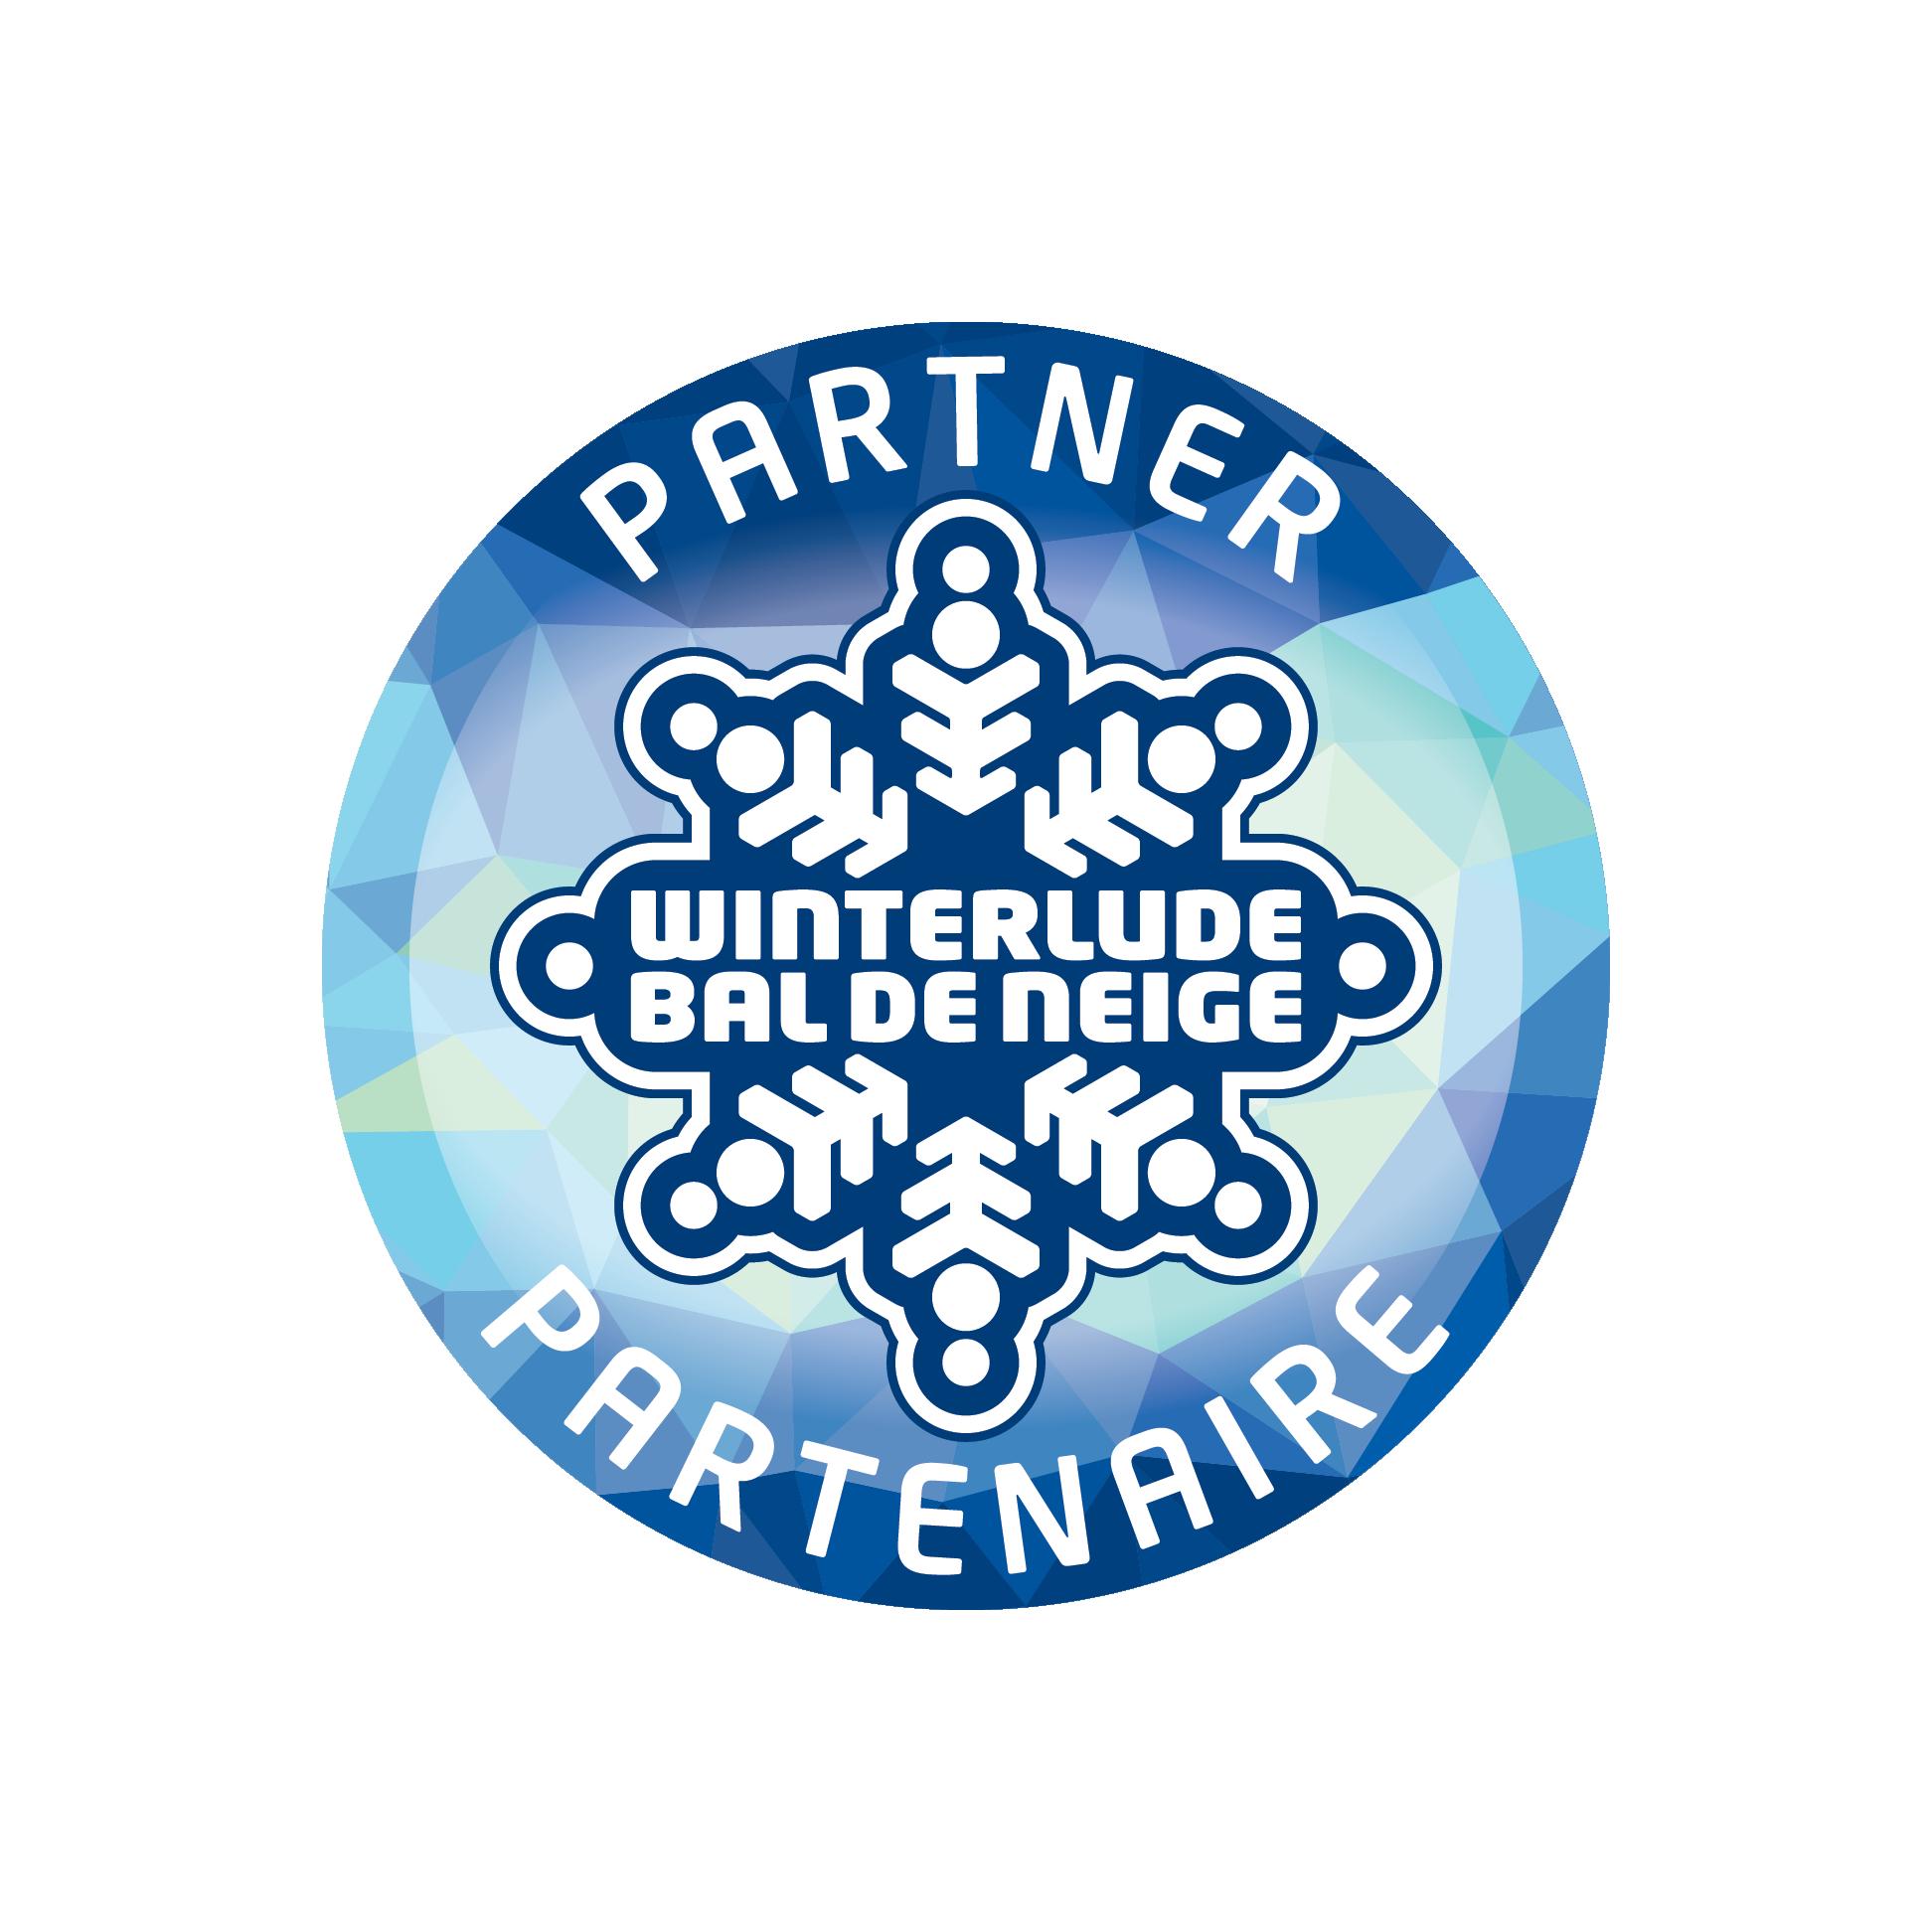 Winterlude partner